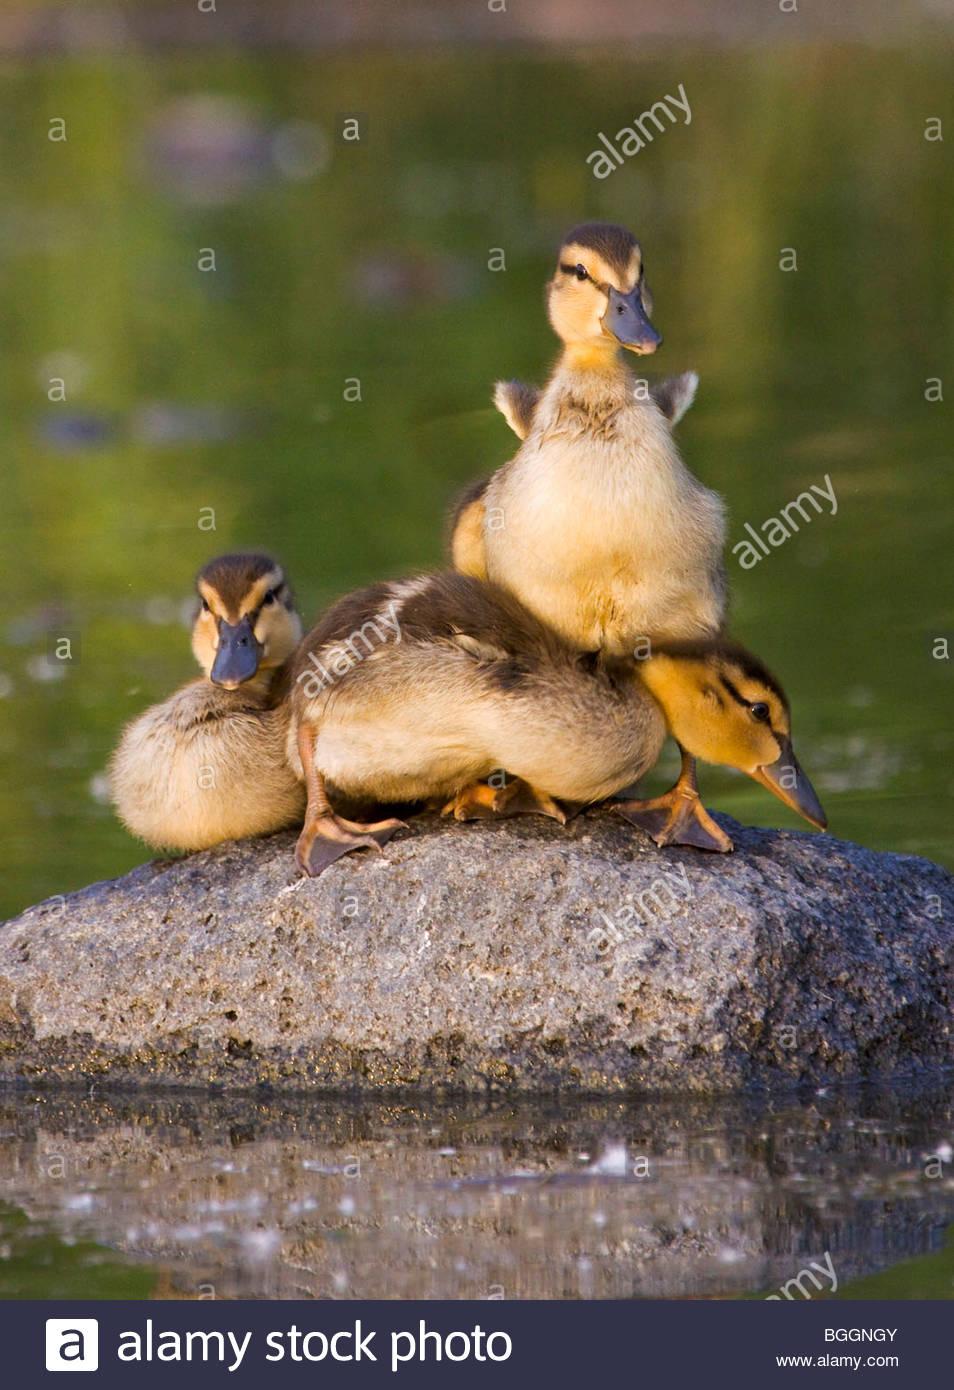 Alaska. Mallard (Anas platyrhynchos) ducklings resting on a rock in Cheney lake, Anchorage. - Stock Image